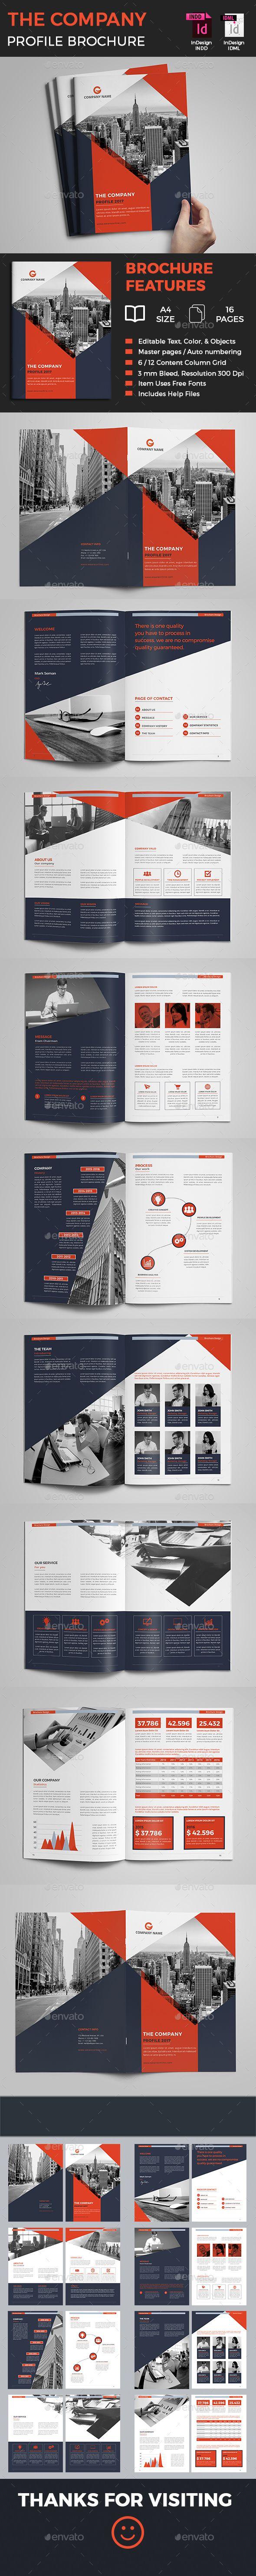 Company Profile - Corporate Brochures Download here : https://graphicriver.net/item/company-profile/19638420?s_rank=119&ref=Al-fatih